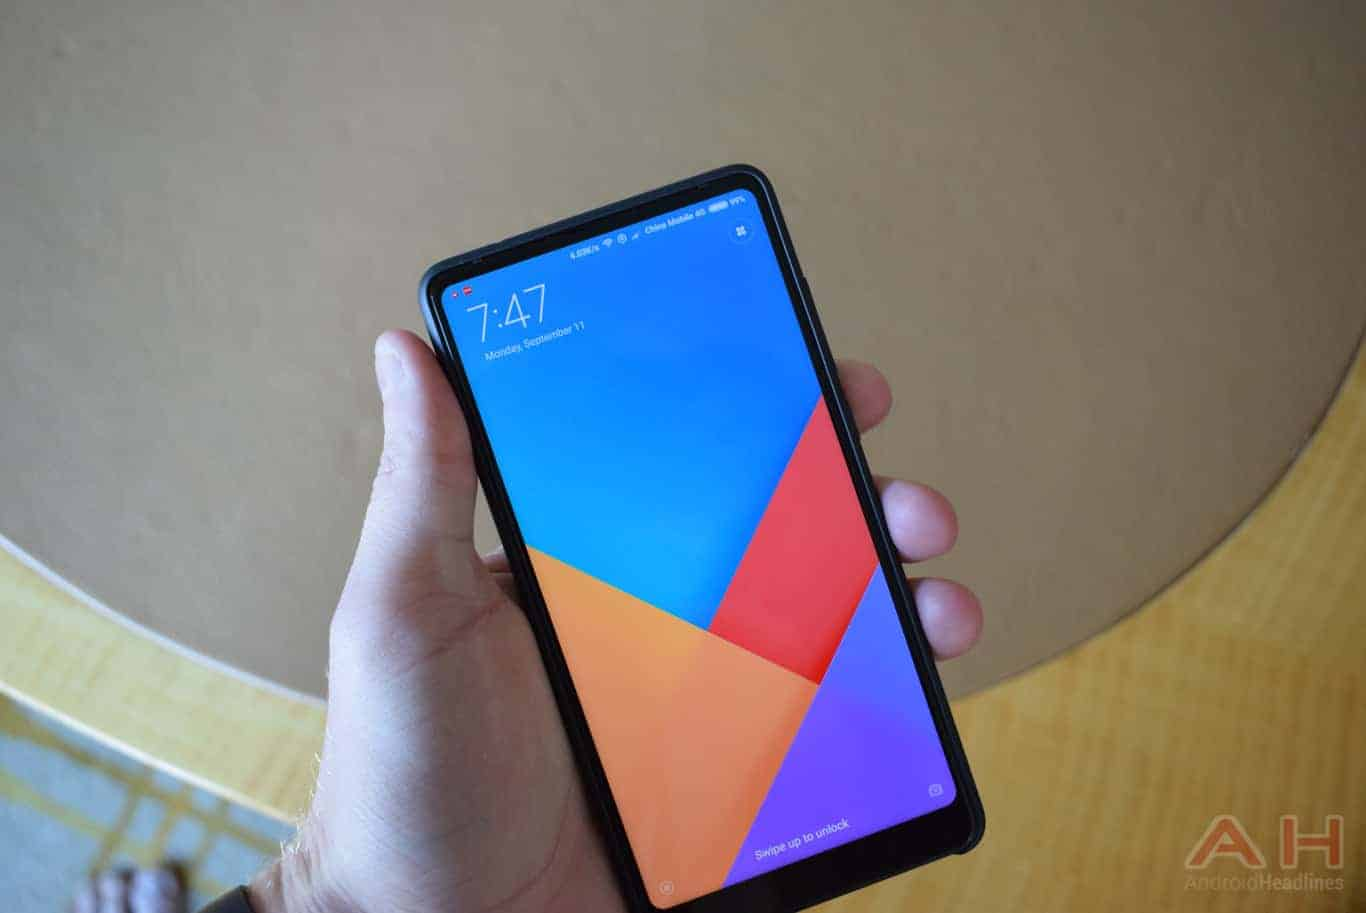 Xiaomi Mi MIX 2 Hands On AM AH 14